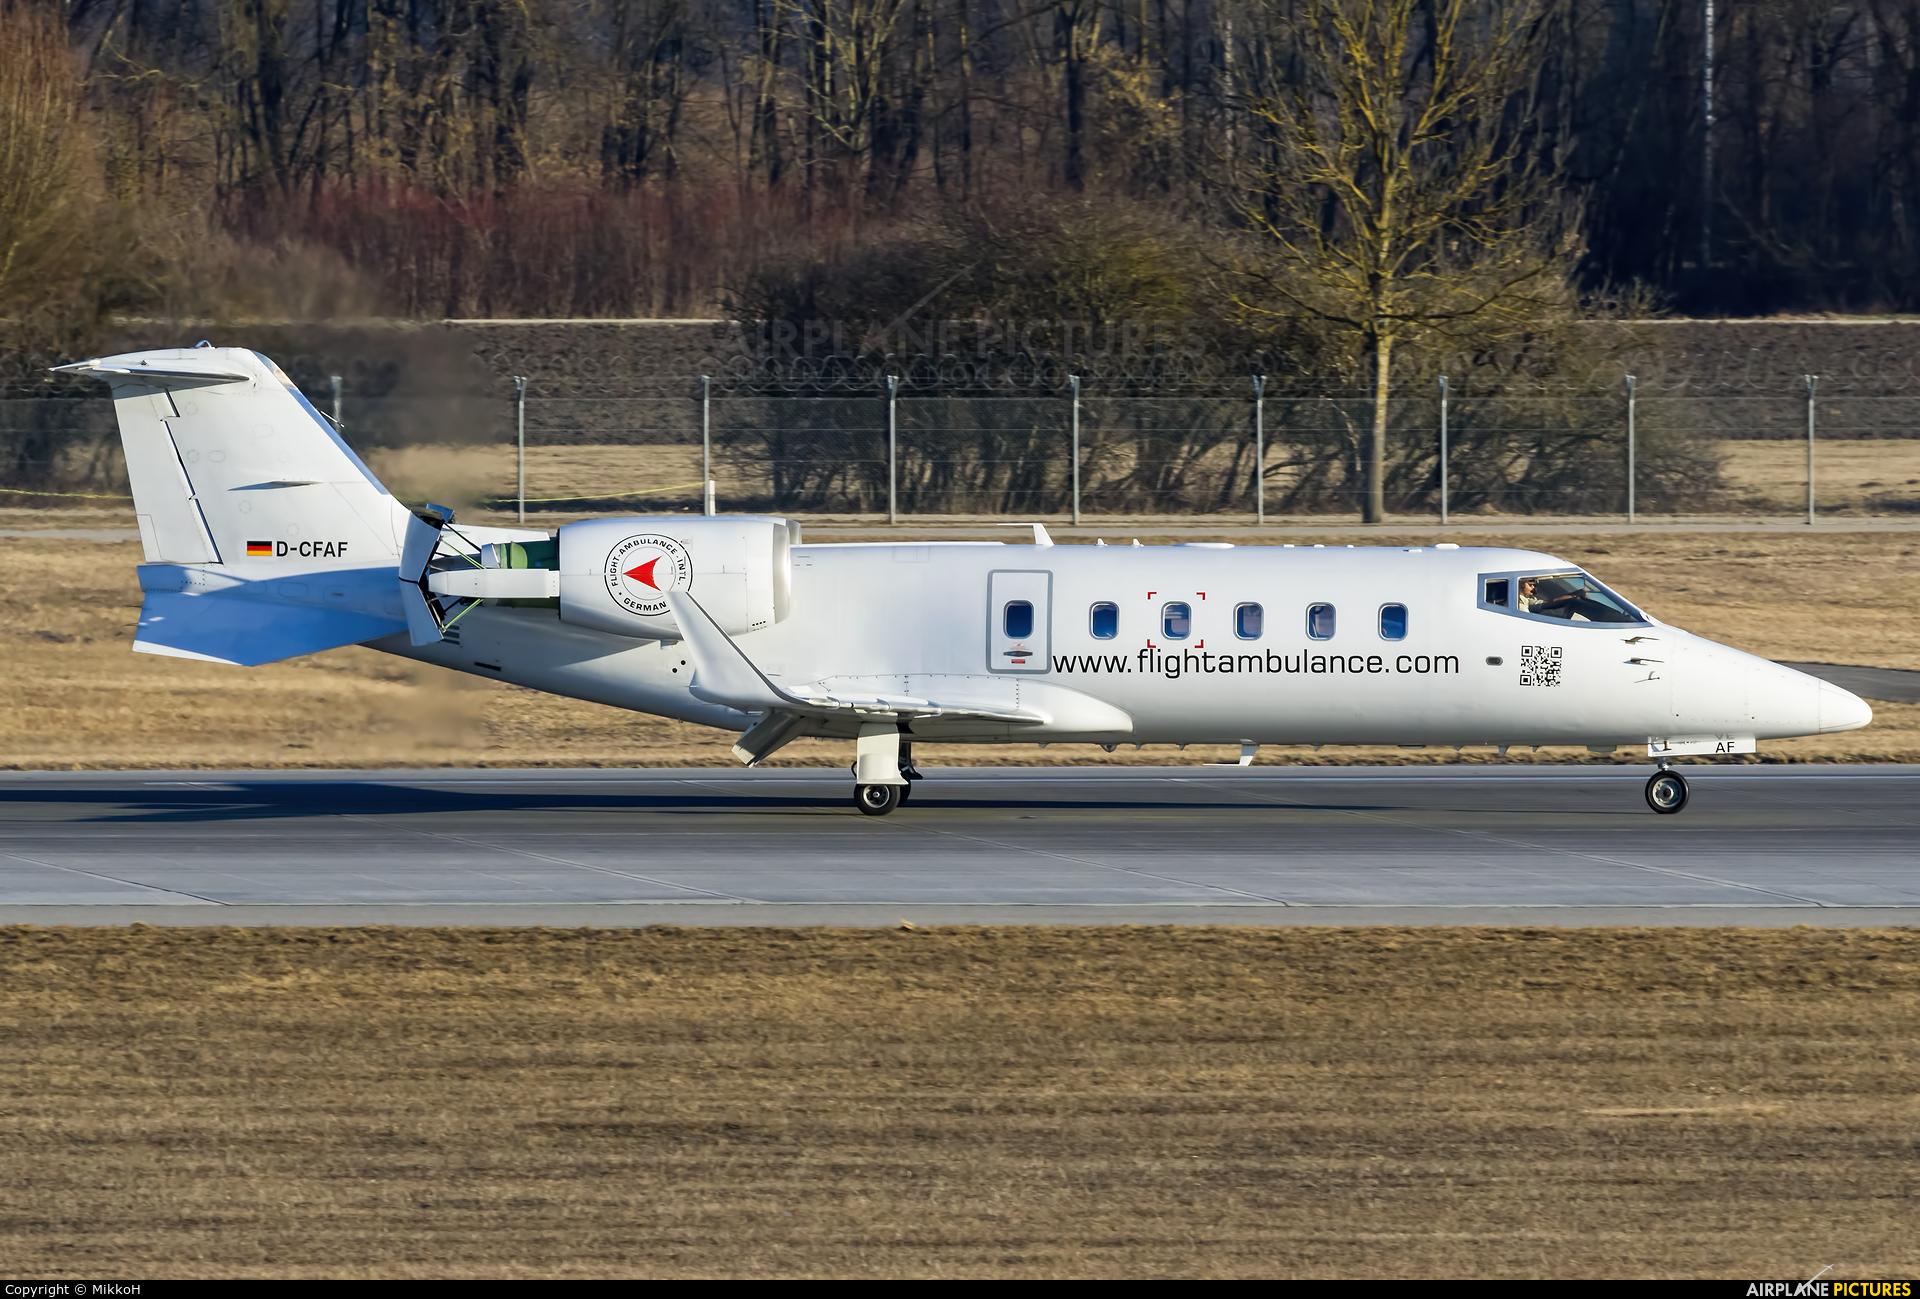 Flight Ambulance D-CFAF aircraft at Munich